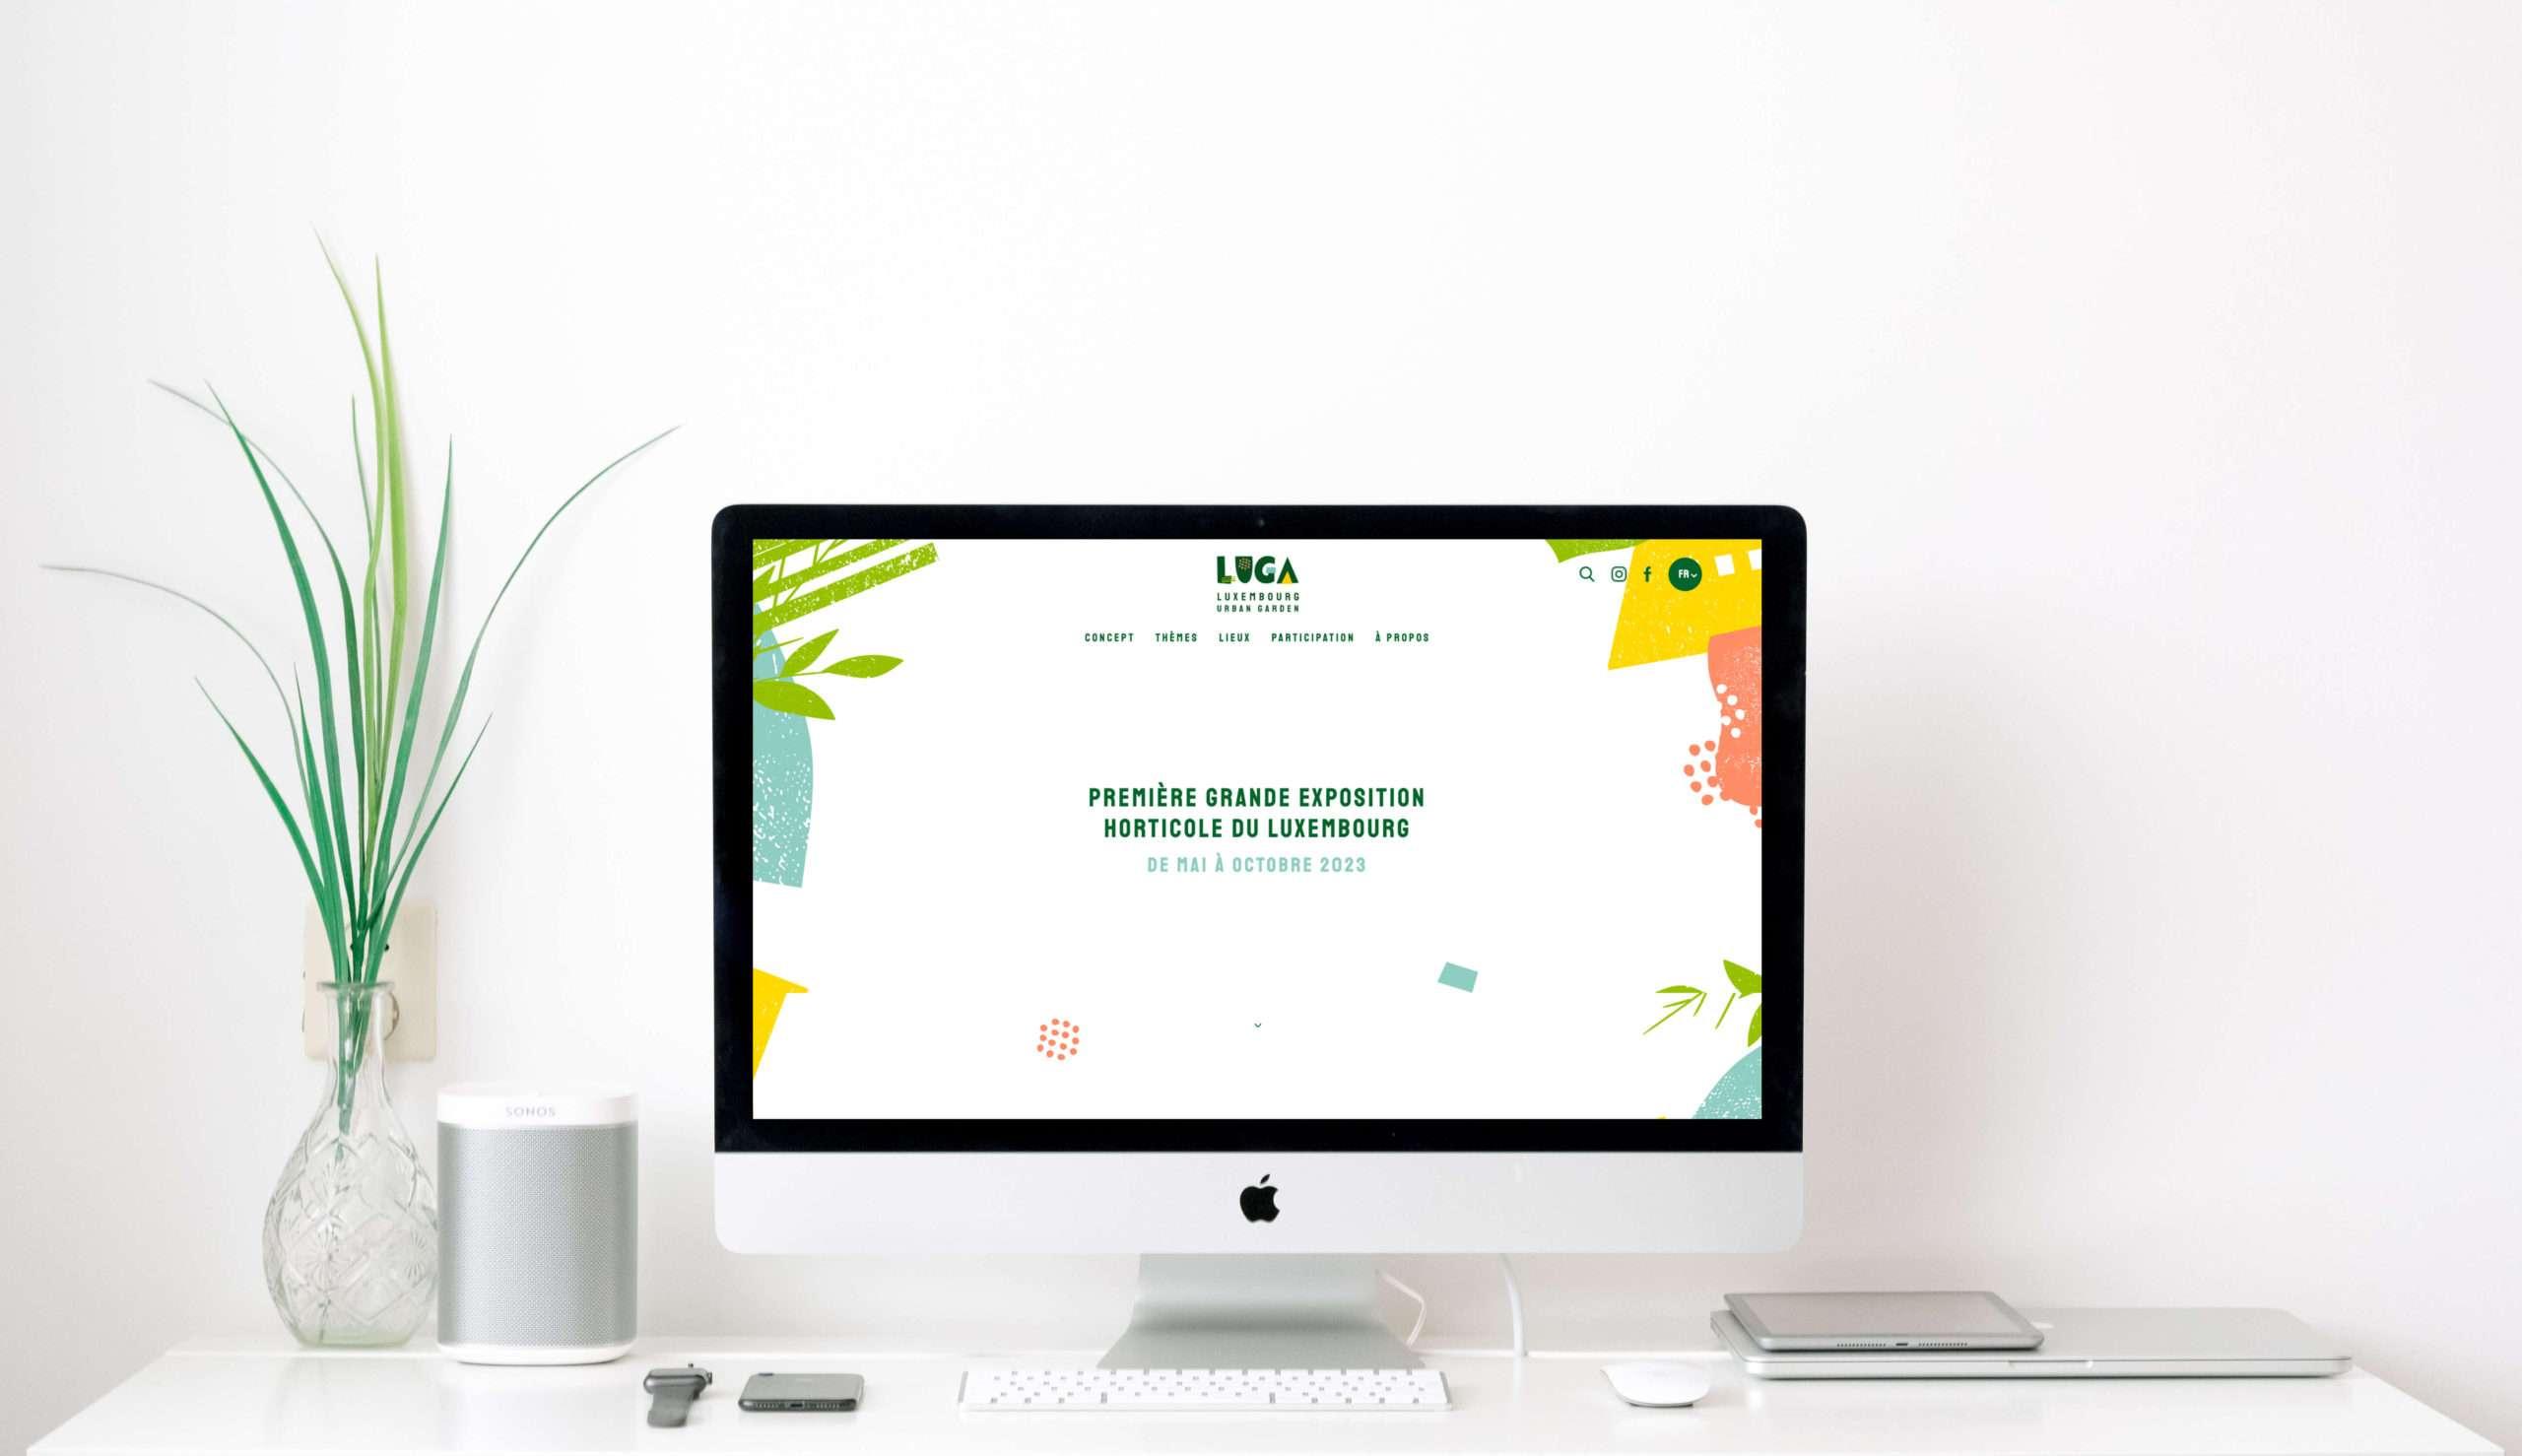 Réalisation du site internet LUGA en responsive design